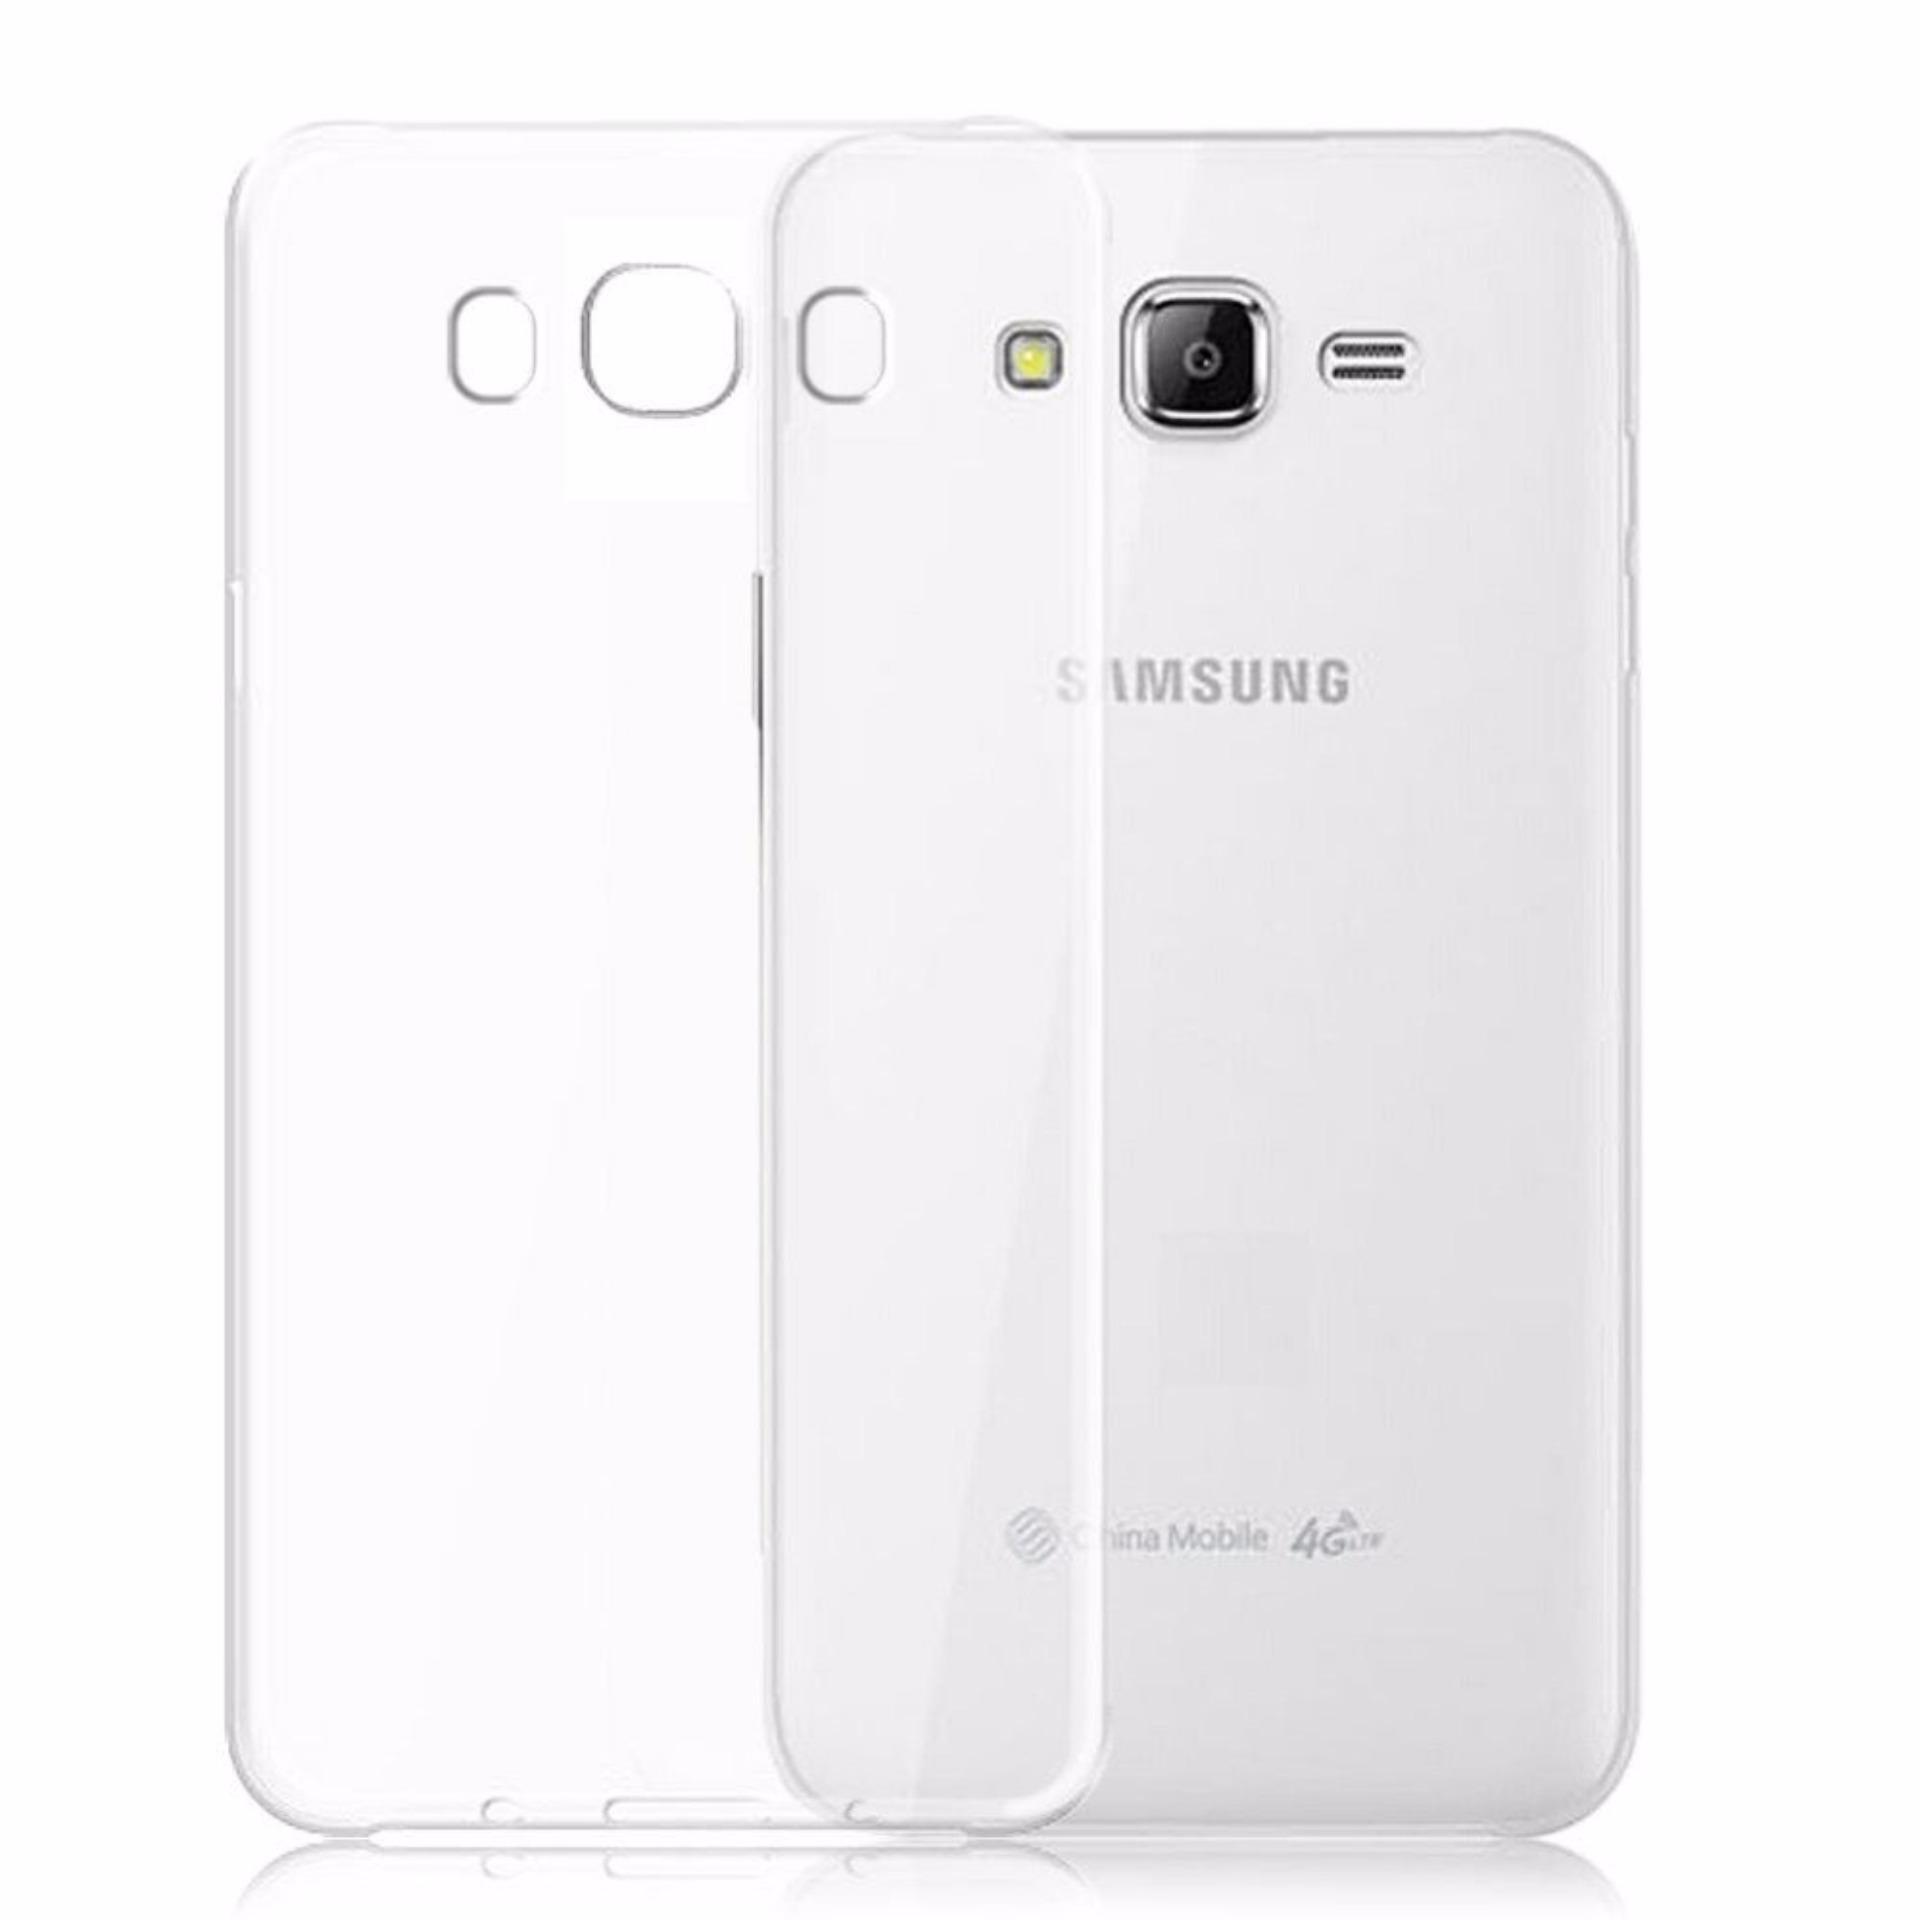 Shopping Comparison Softcase Jelly Ultrathin For Samsung Galaxy J7 2016 ( j710) PutihTransparan - Aircase